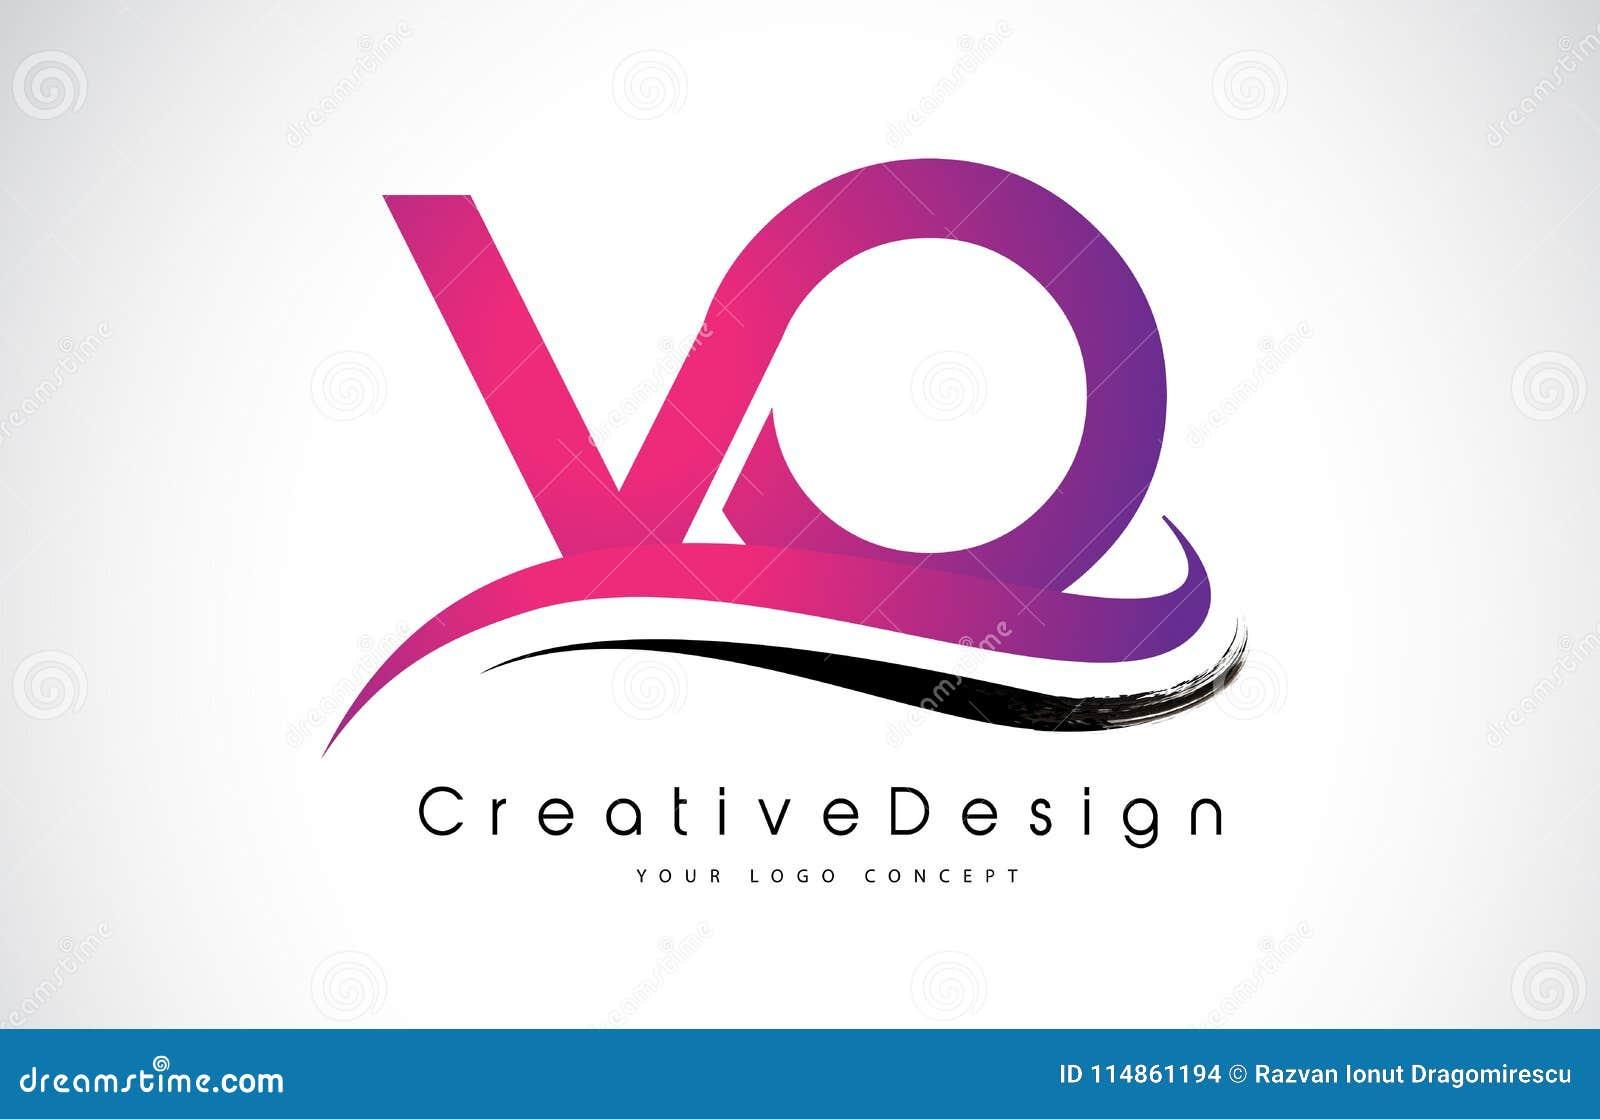 VO V O Letter Logo Design. Creative Icon Modern Letters Vector L ...